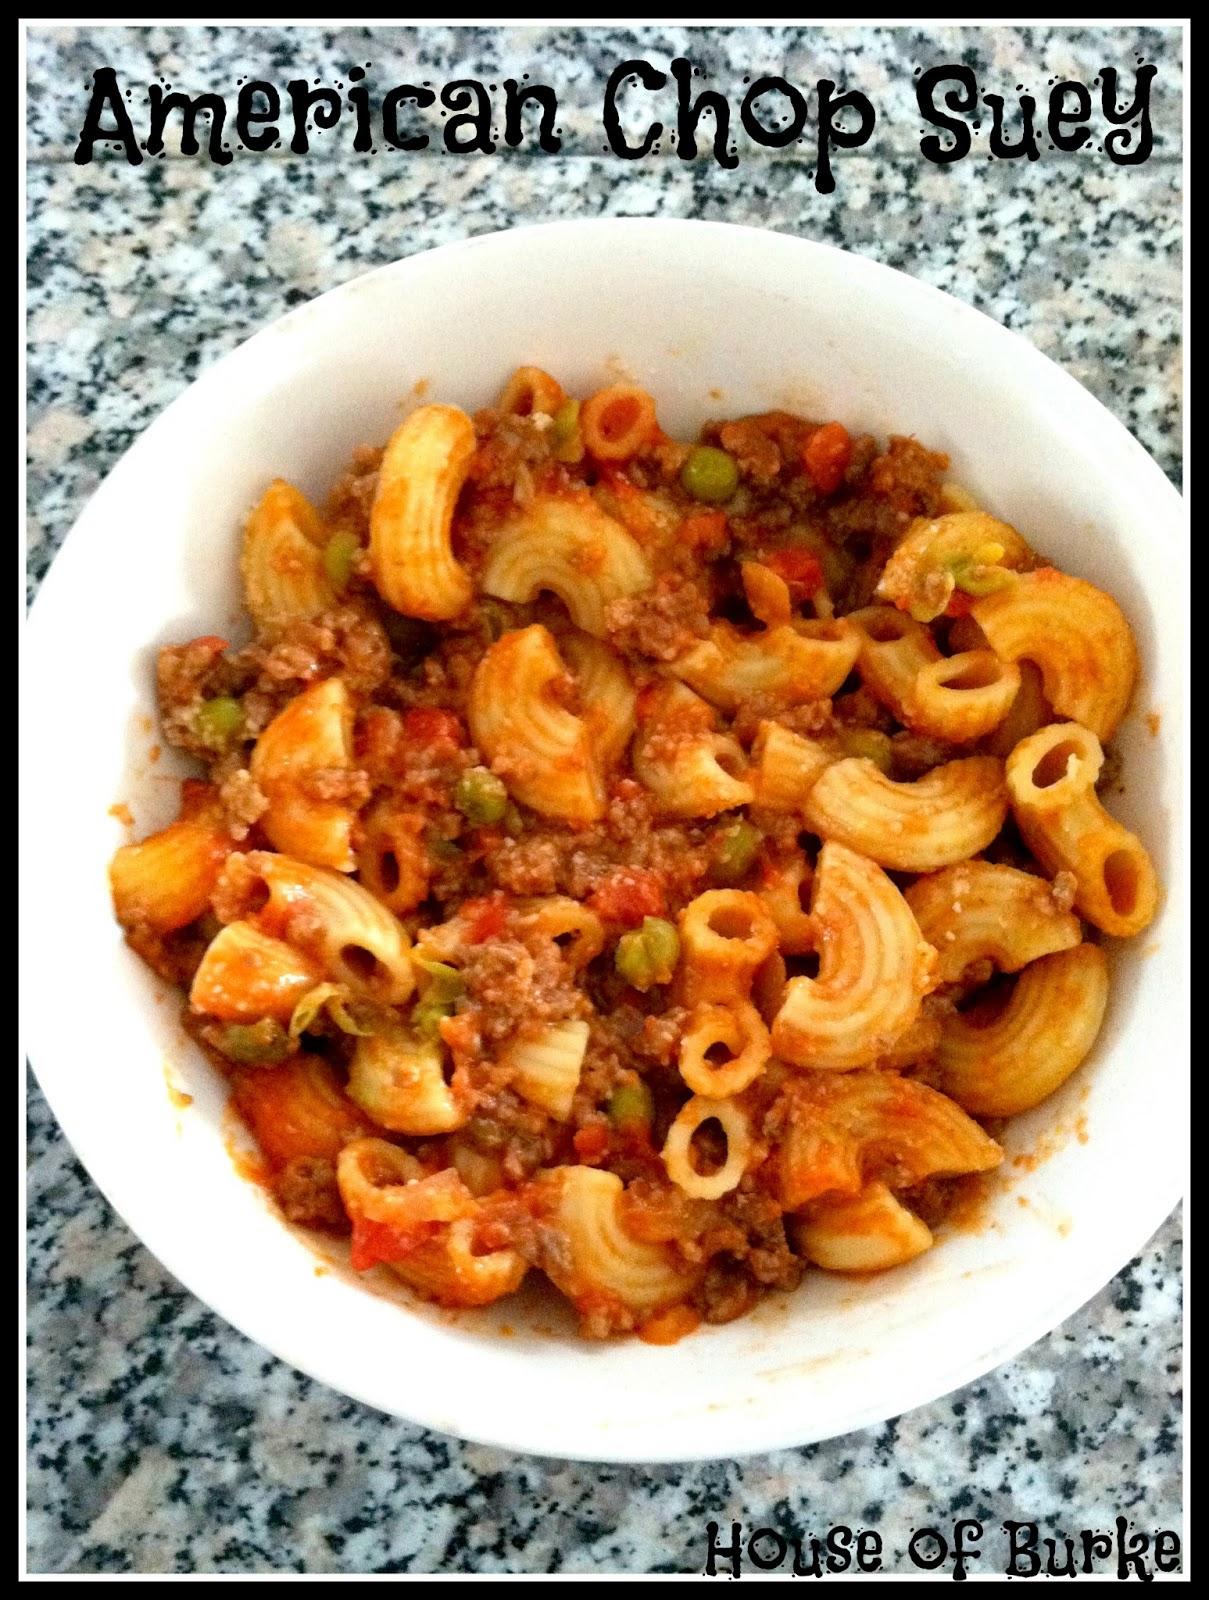 House of Burke: Tasty Tuesday: American Chop Suey